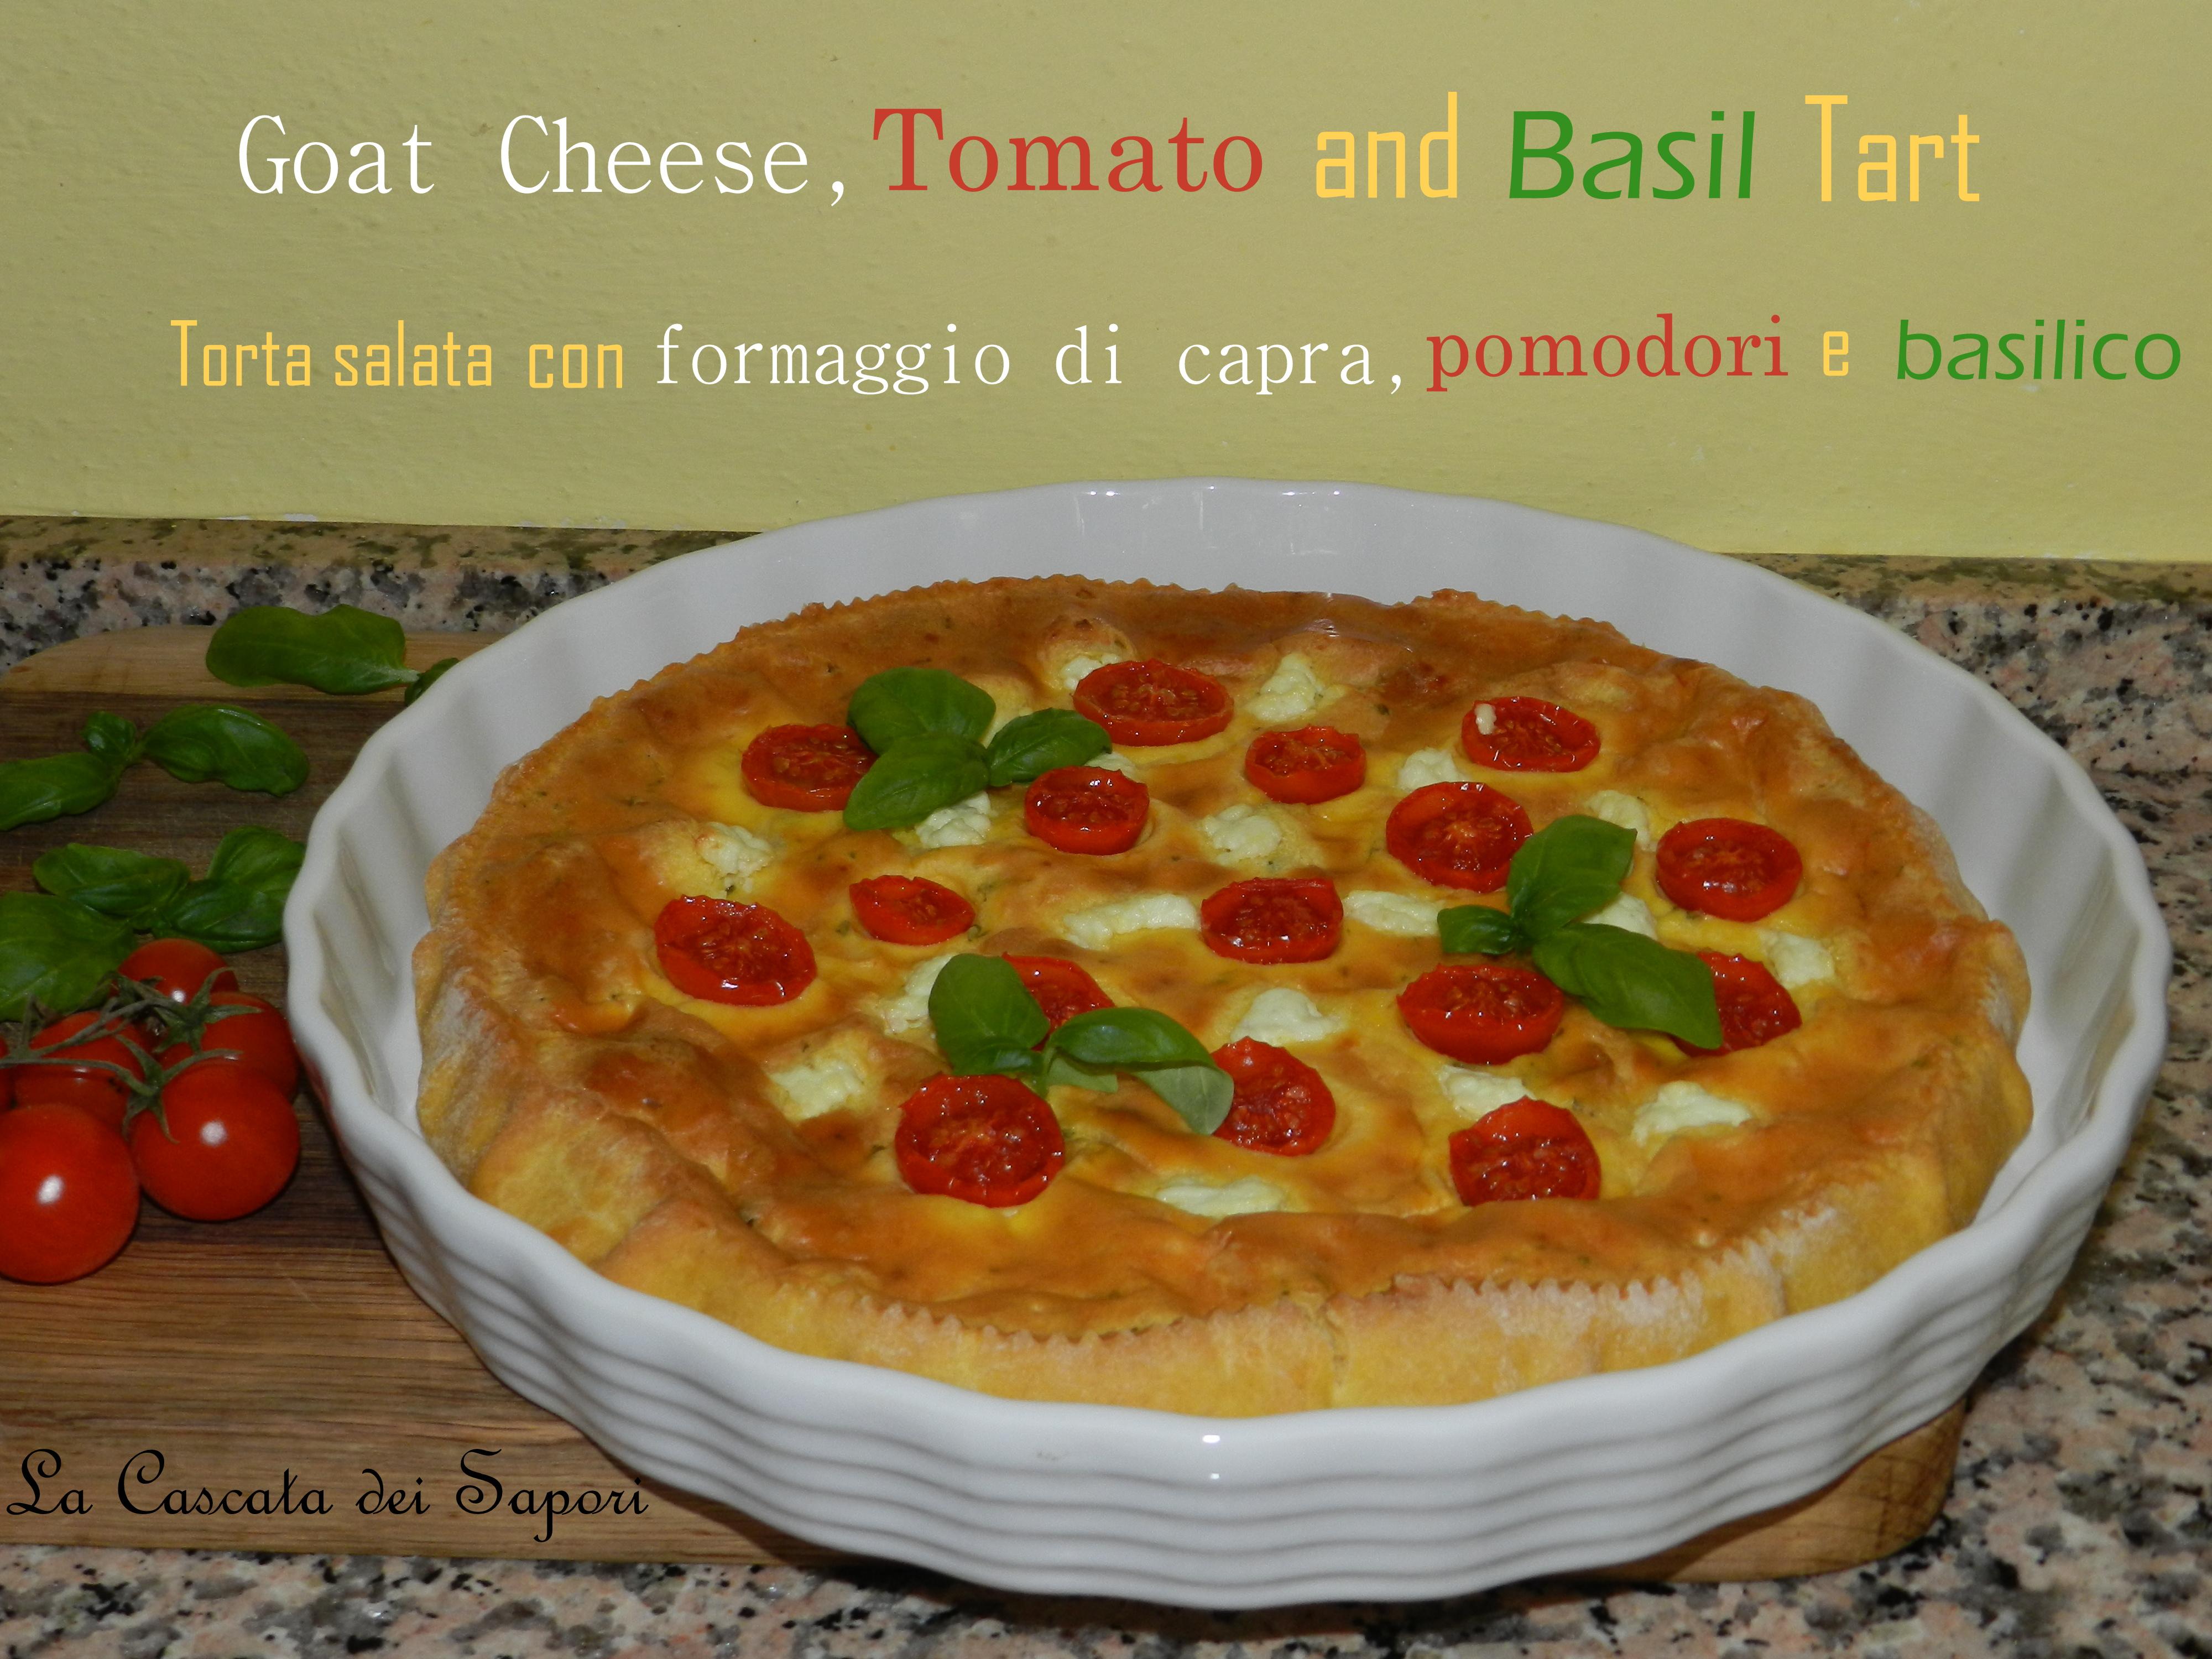 Goat Cheese, Tomato and Basil Tart